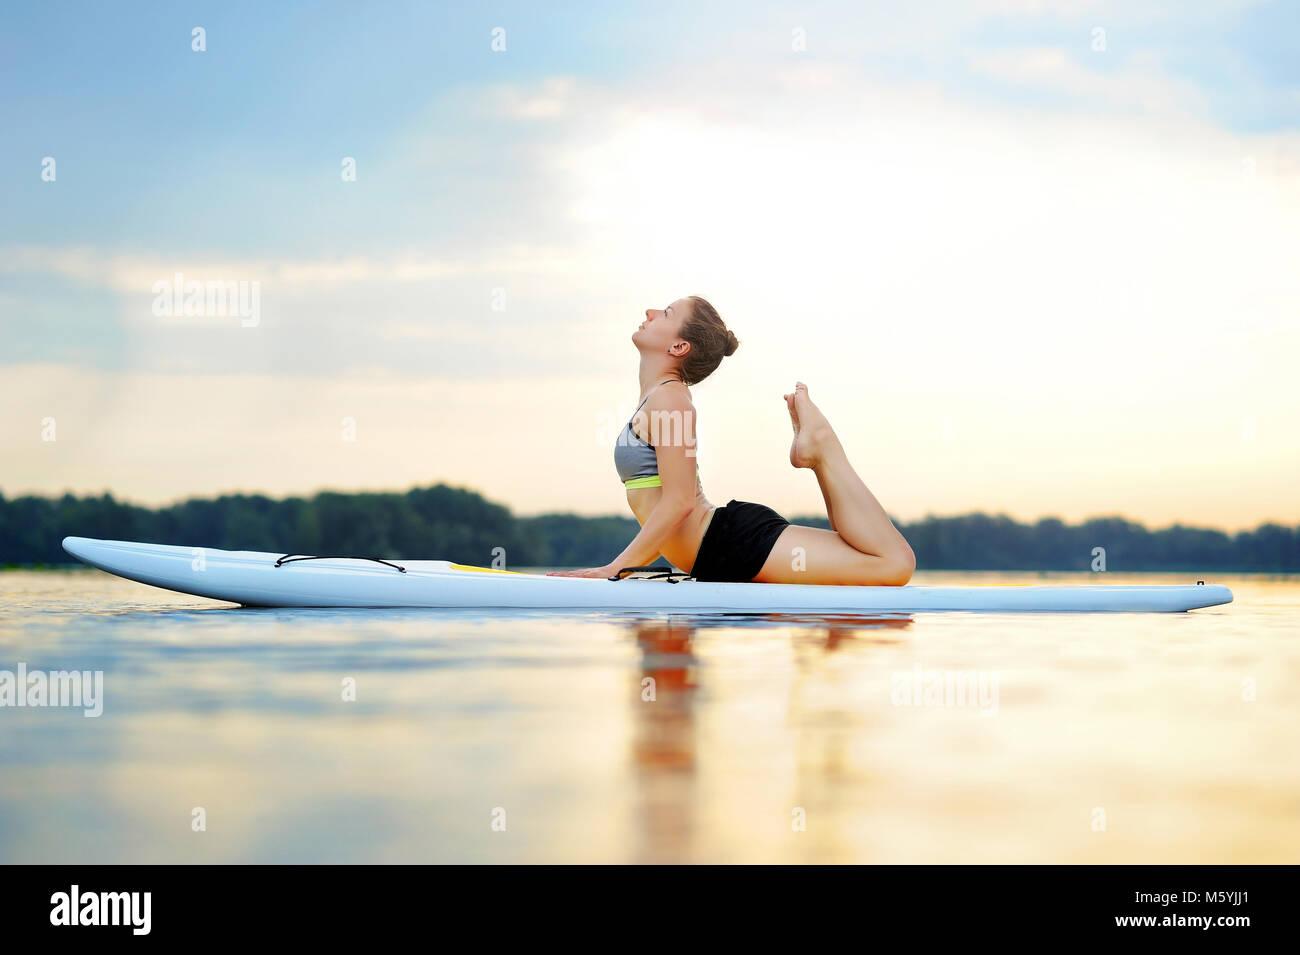 Woman on sup board practicing cobra yoga pose - Stock Image